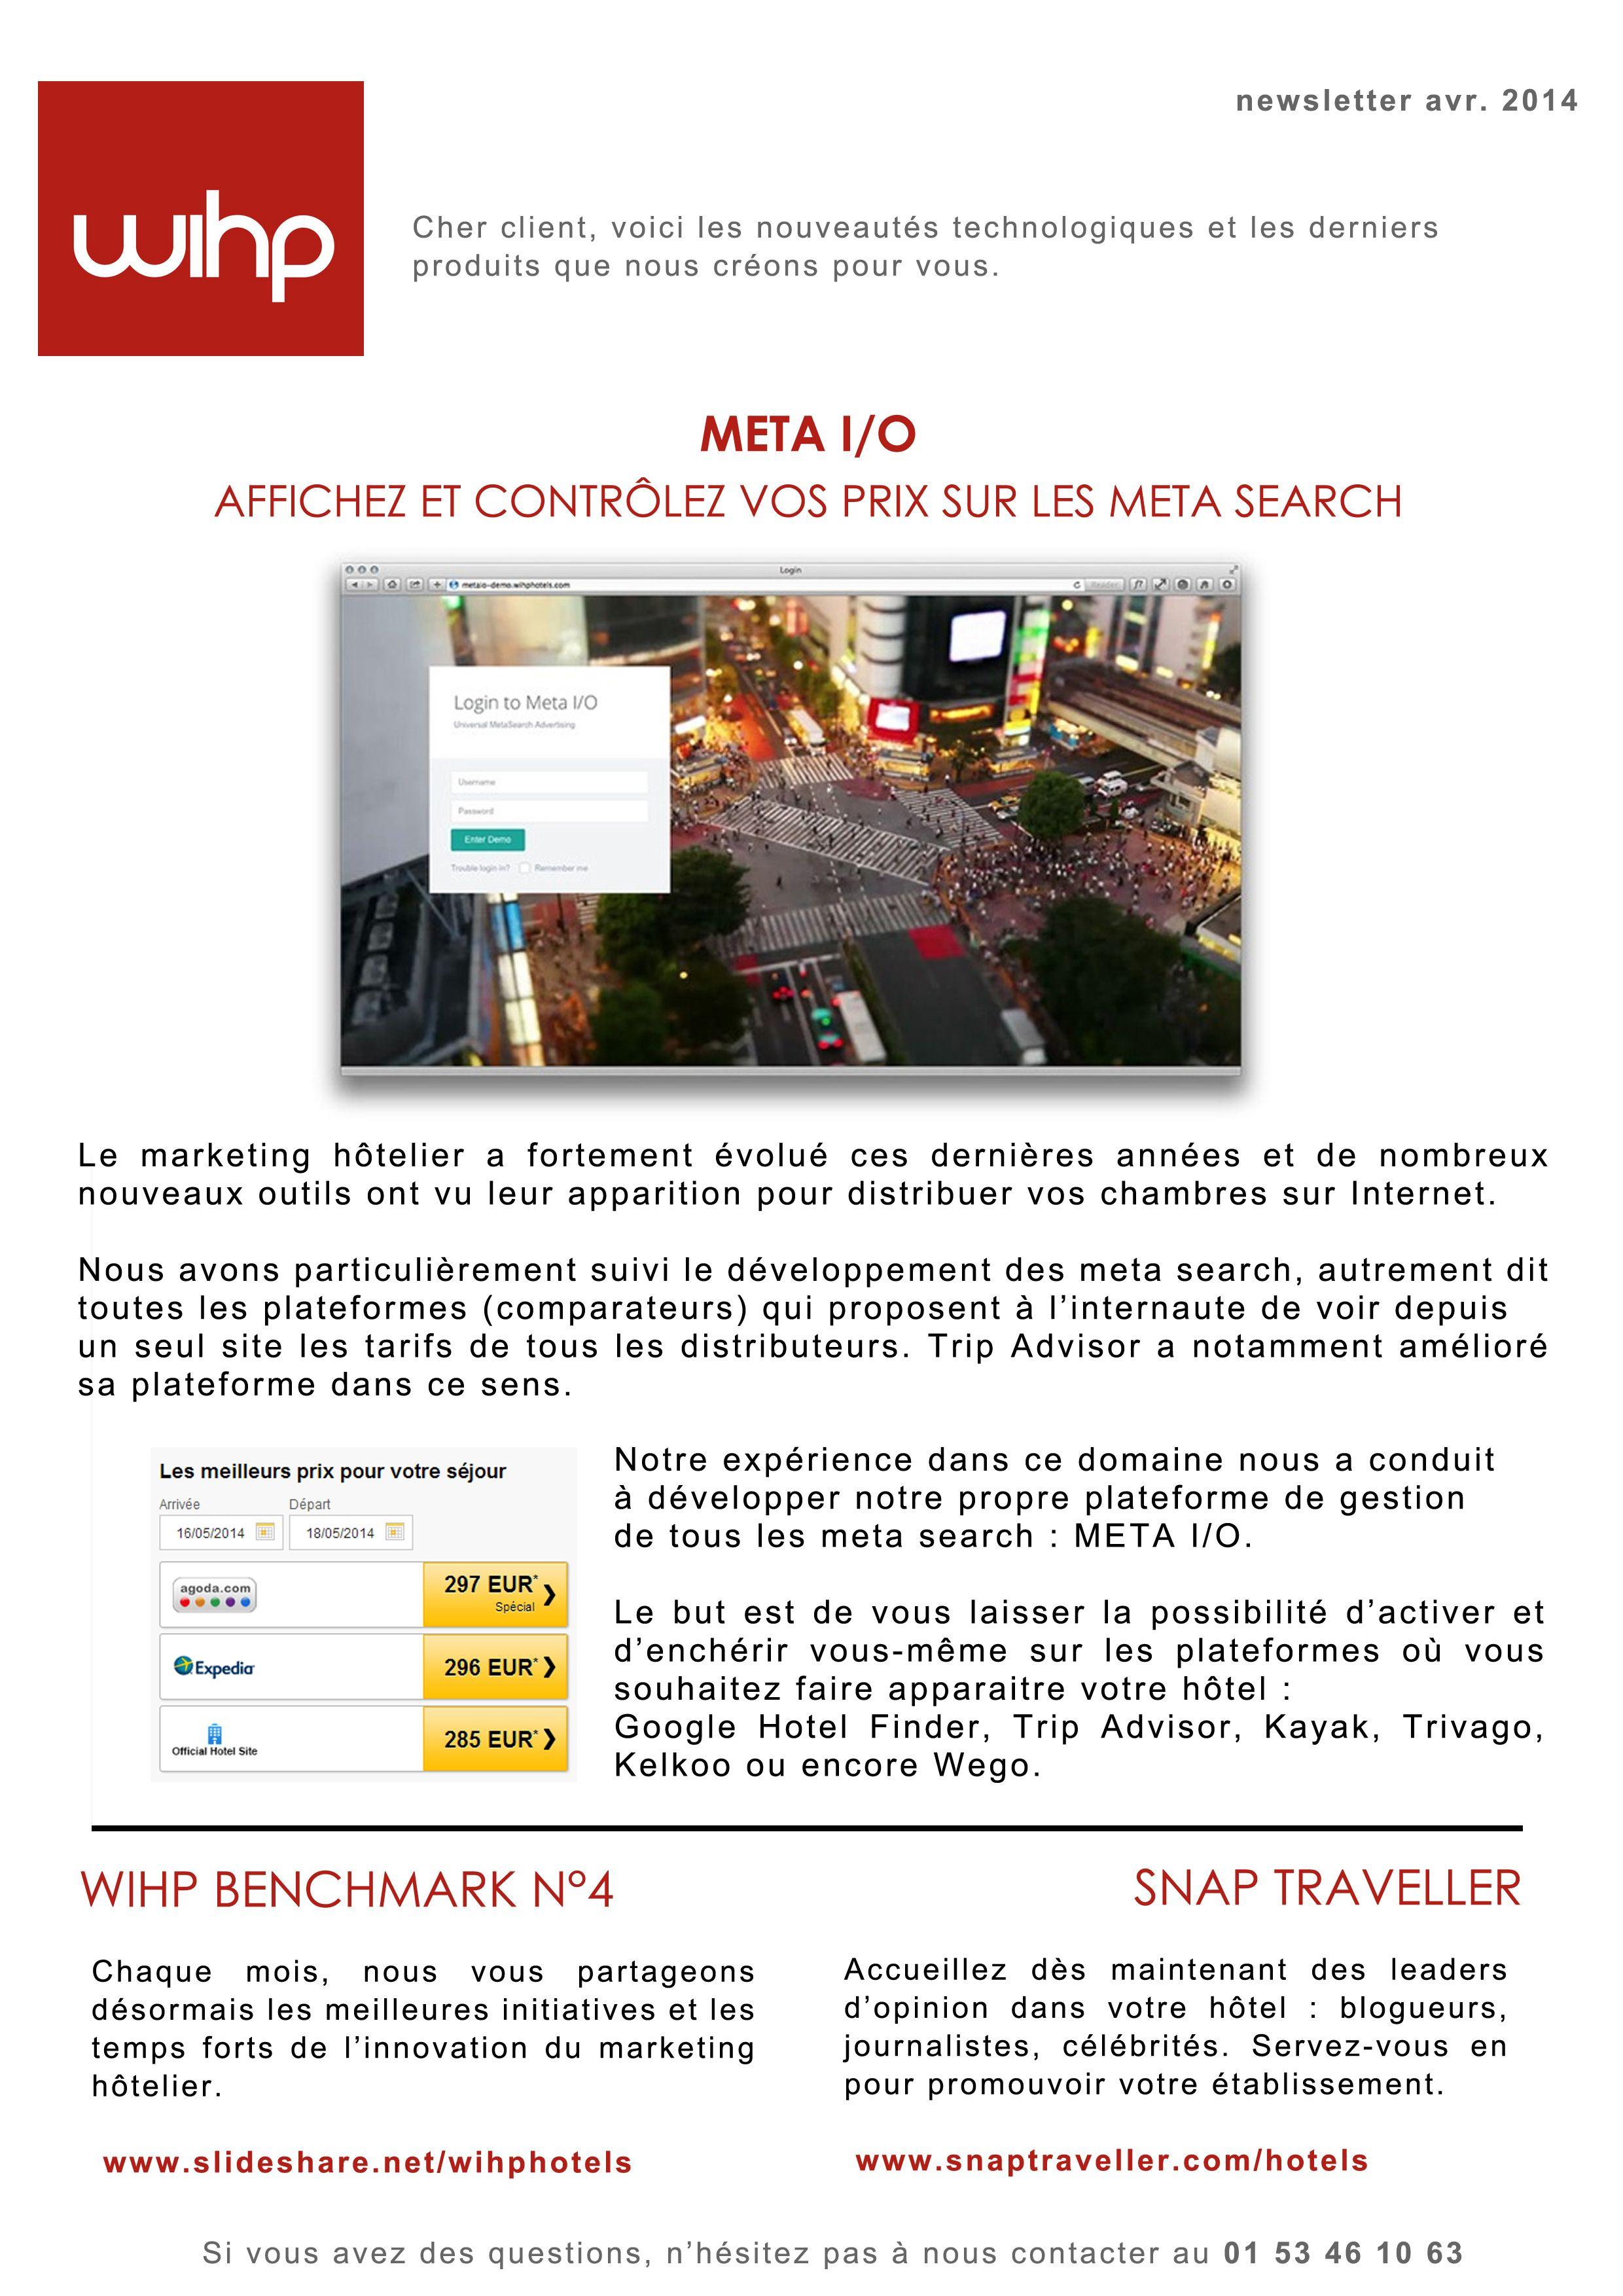 WIHP Newsletter #4 - 2014